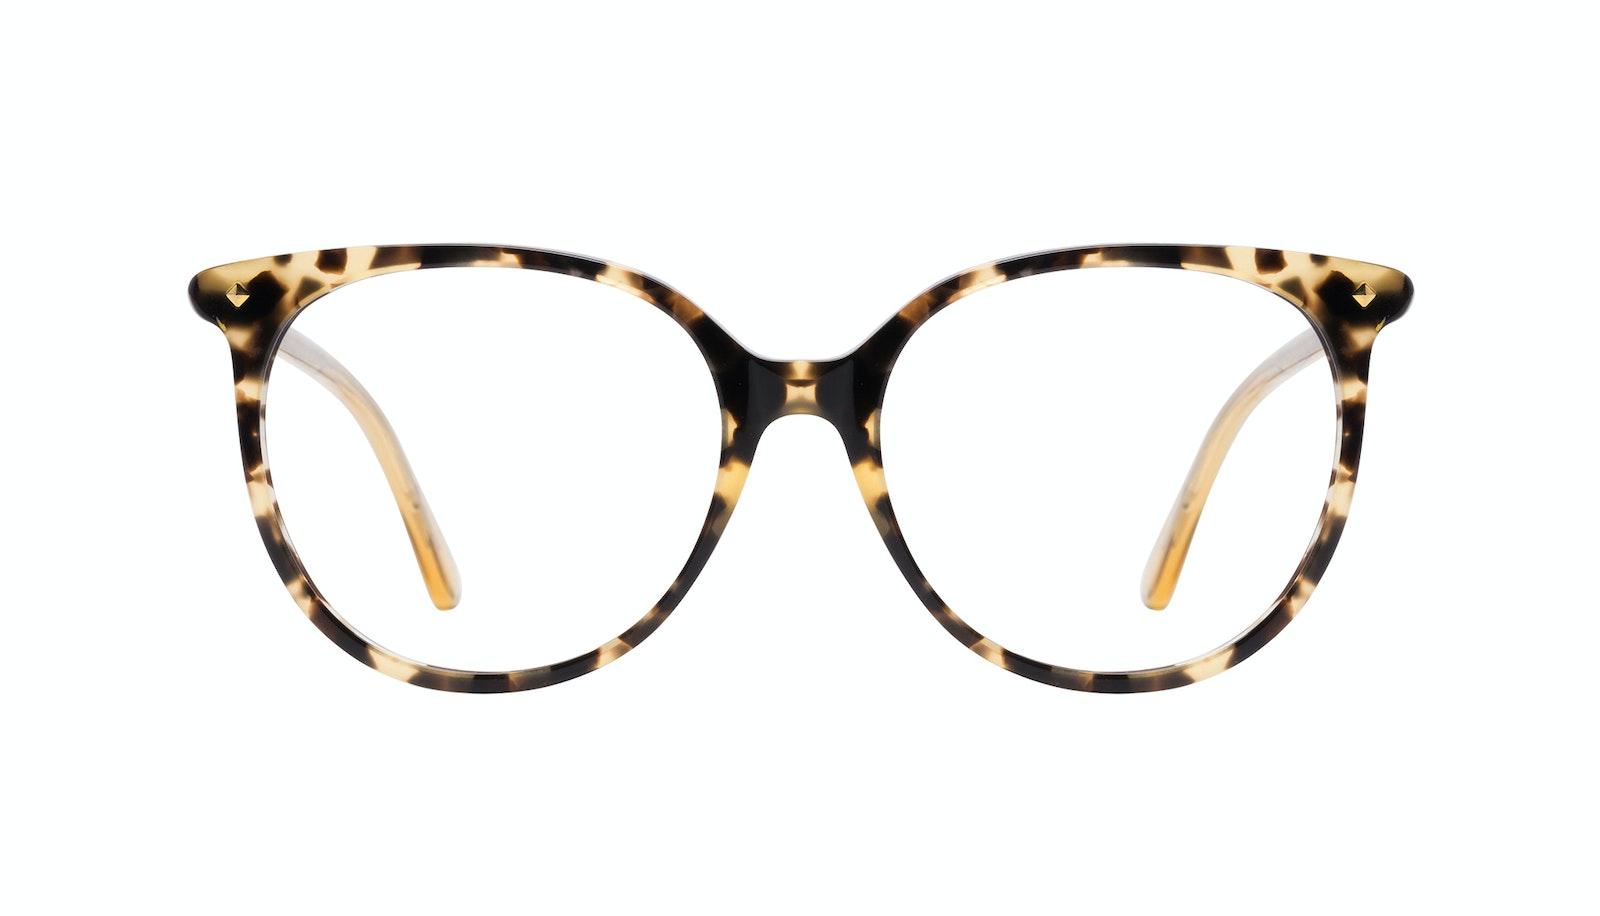 Affordable Fashion Glasses Round Eyeglasses Women Area Petite Bingal